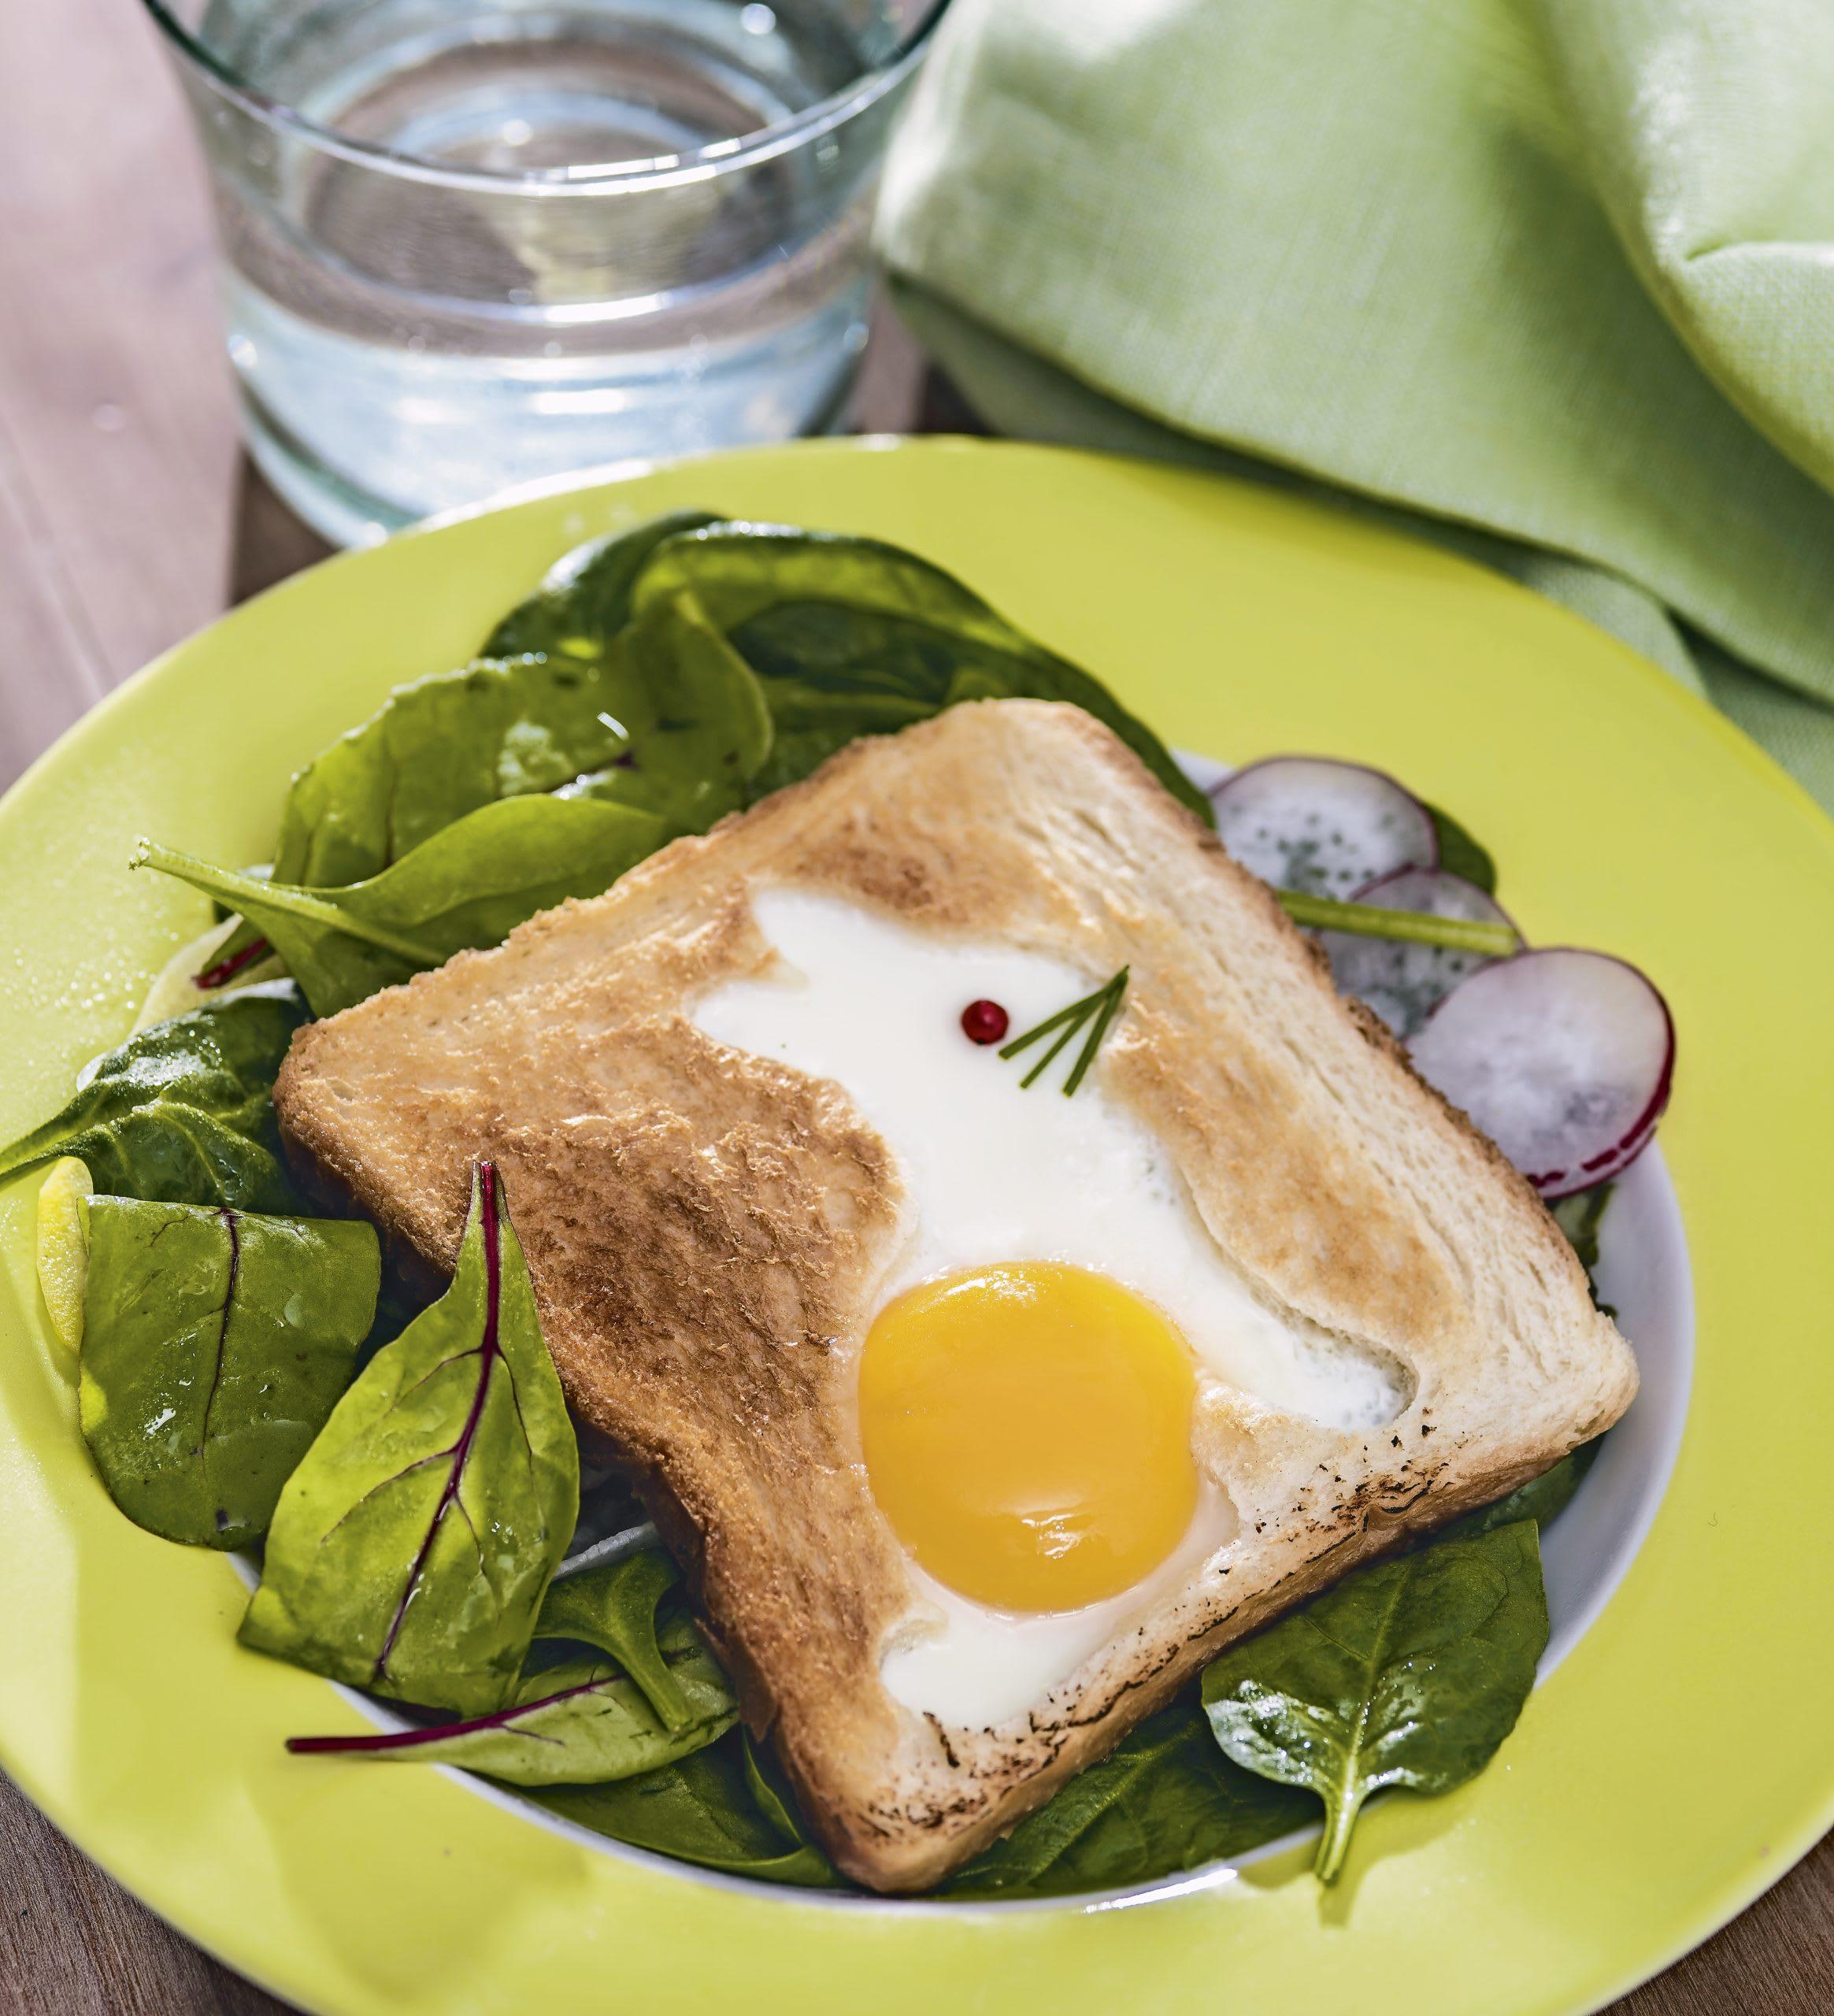 Toasts lapins et salade printanière